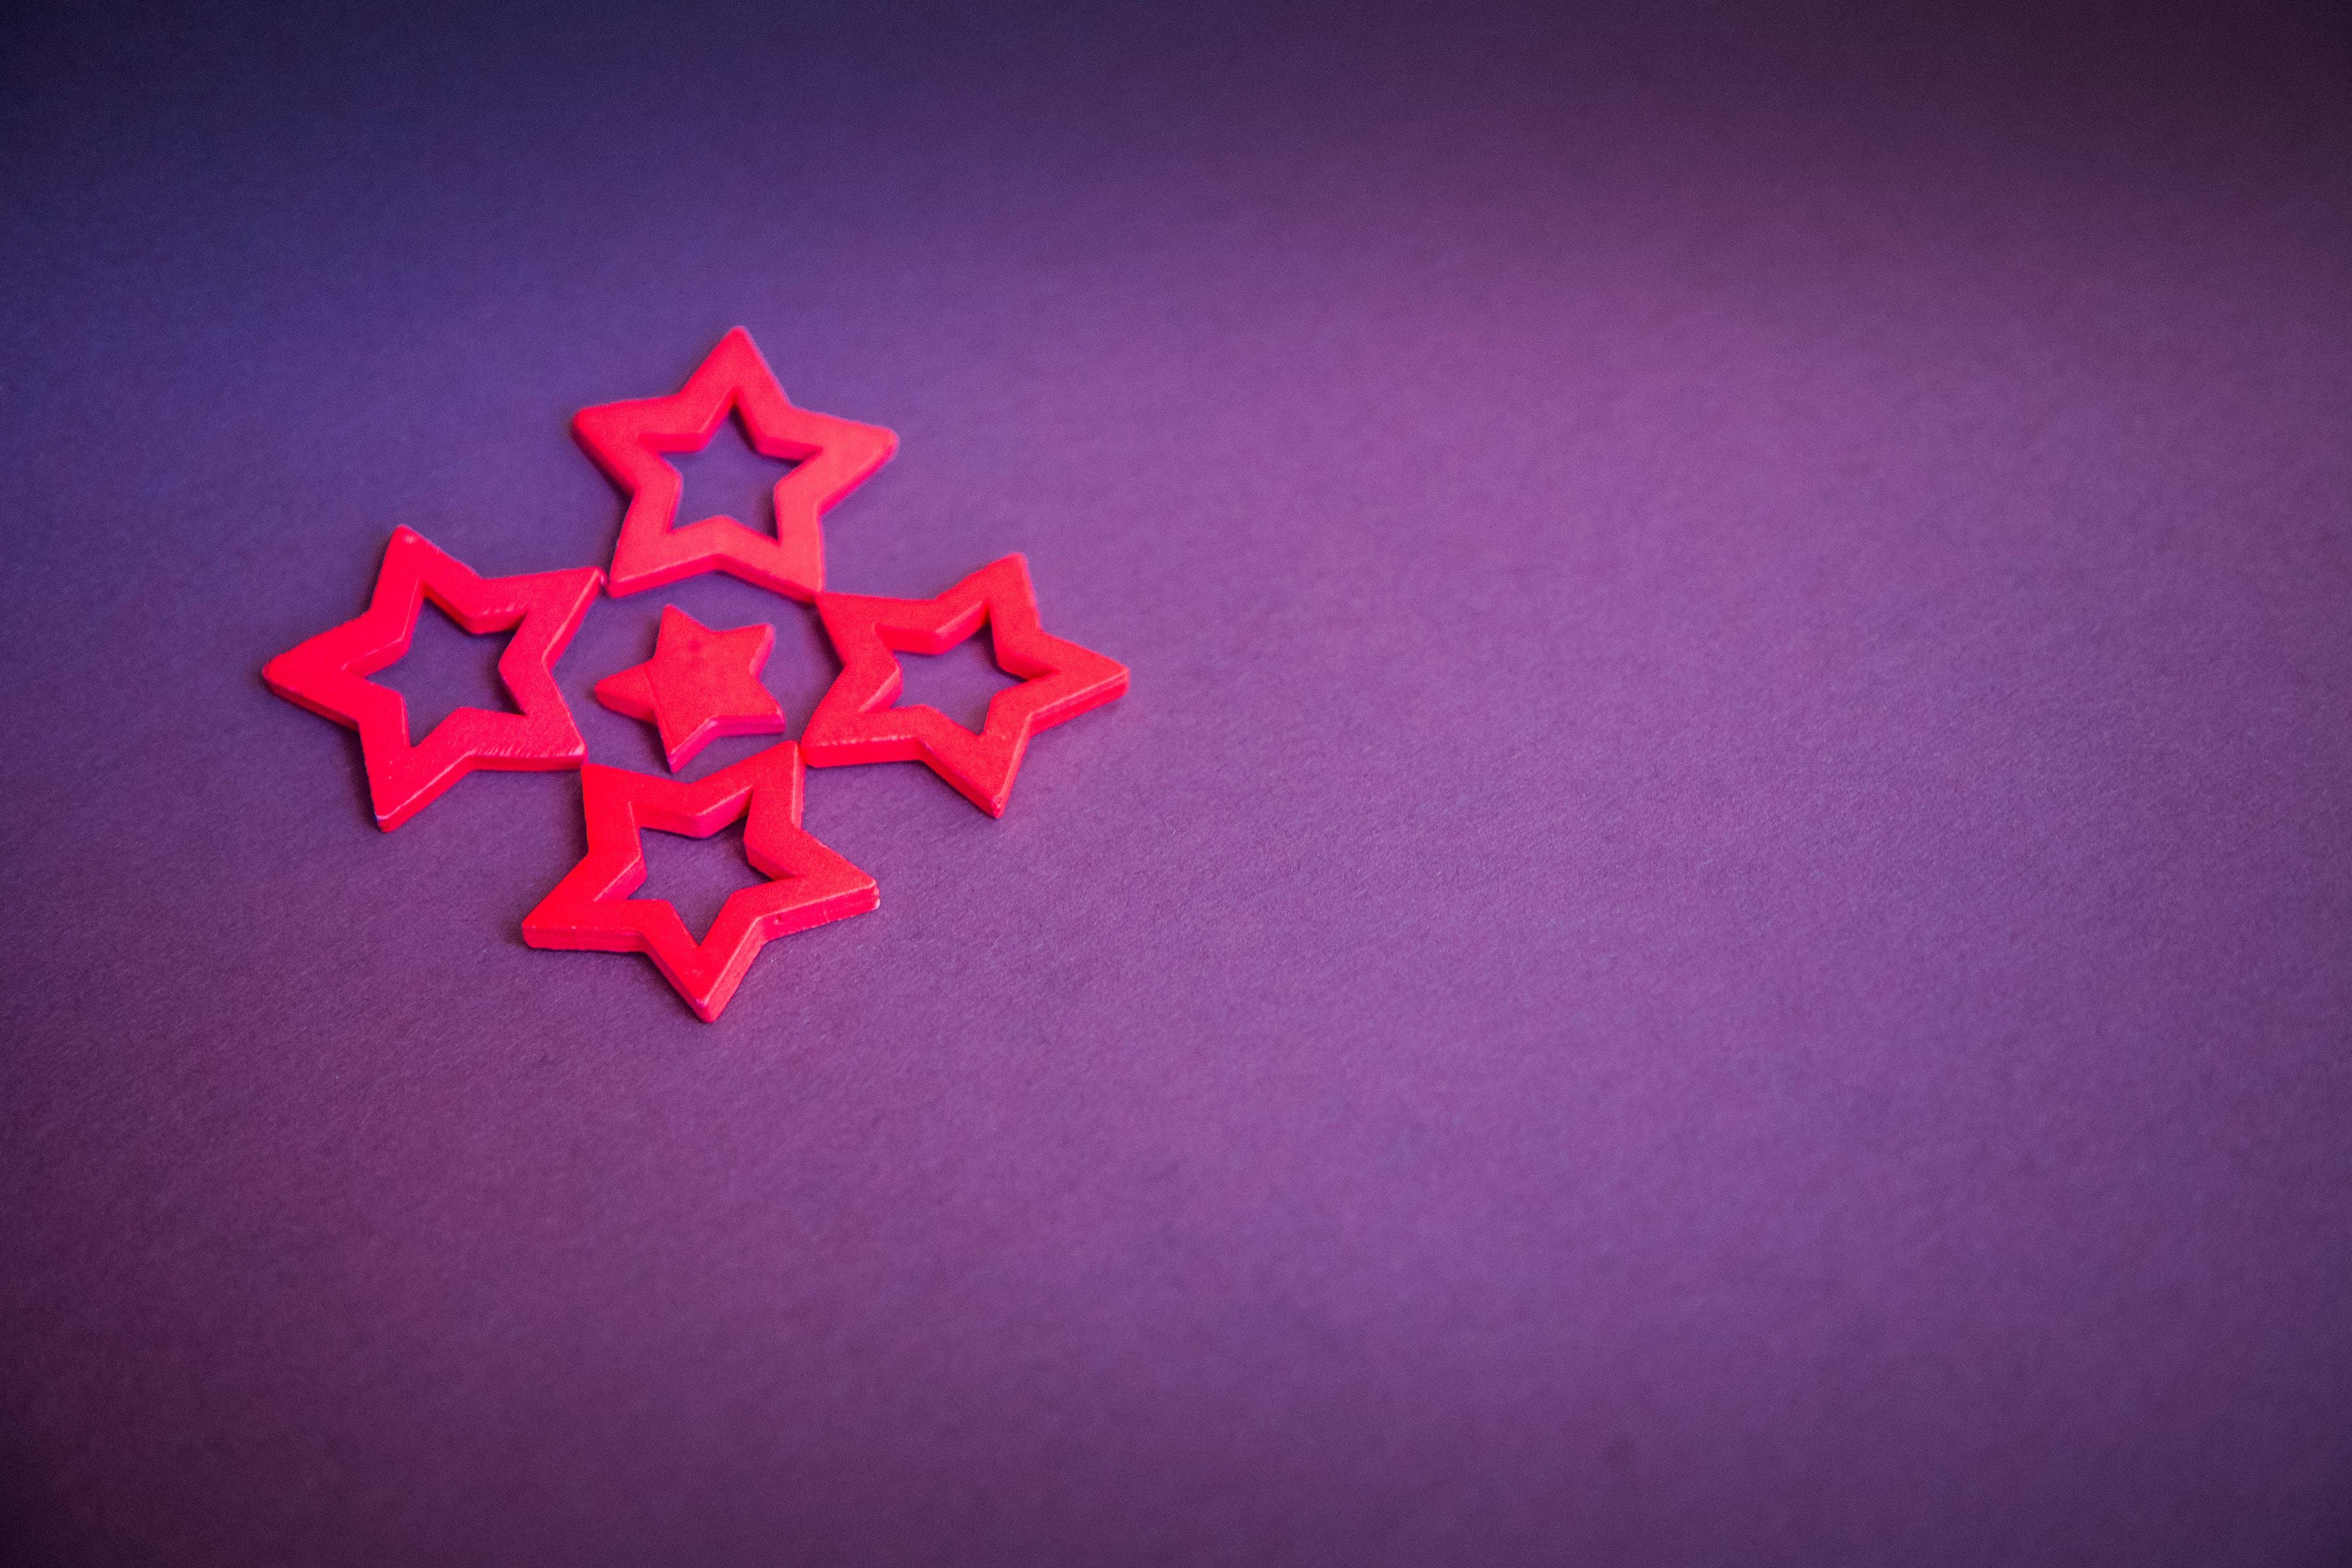 Red Star Decor